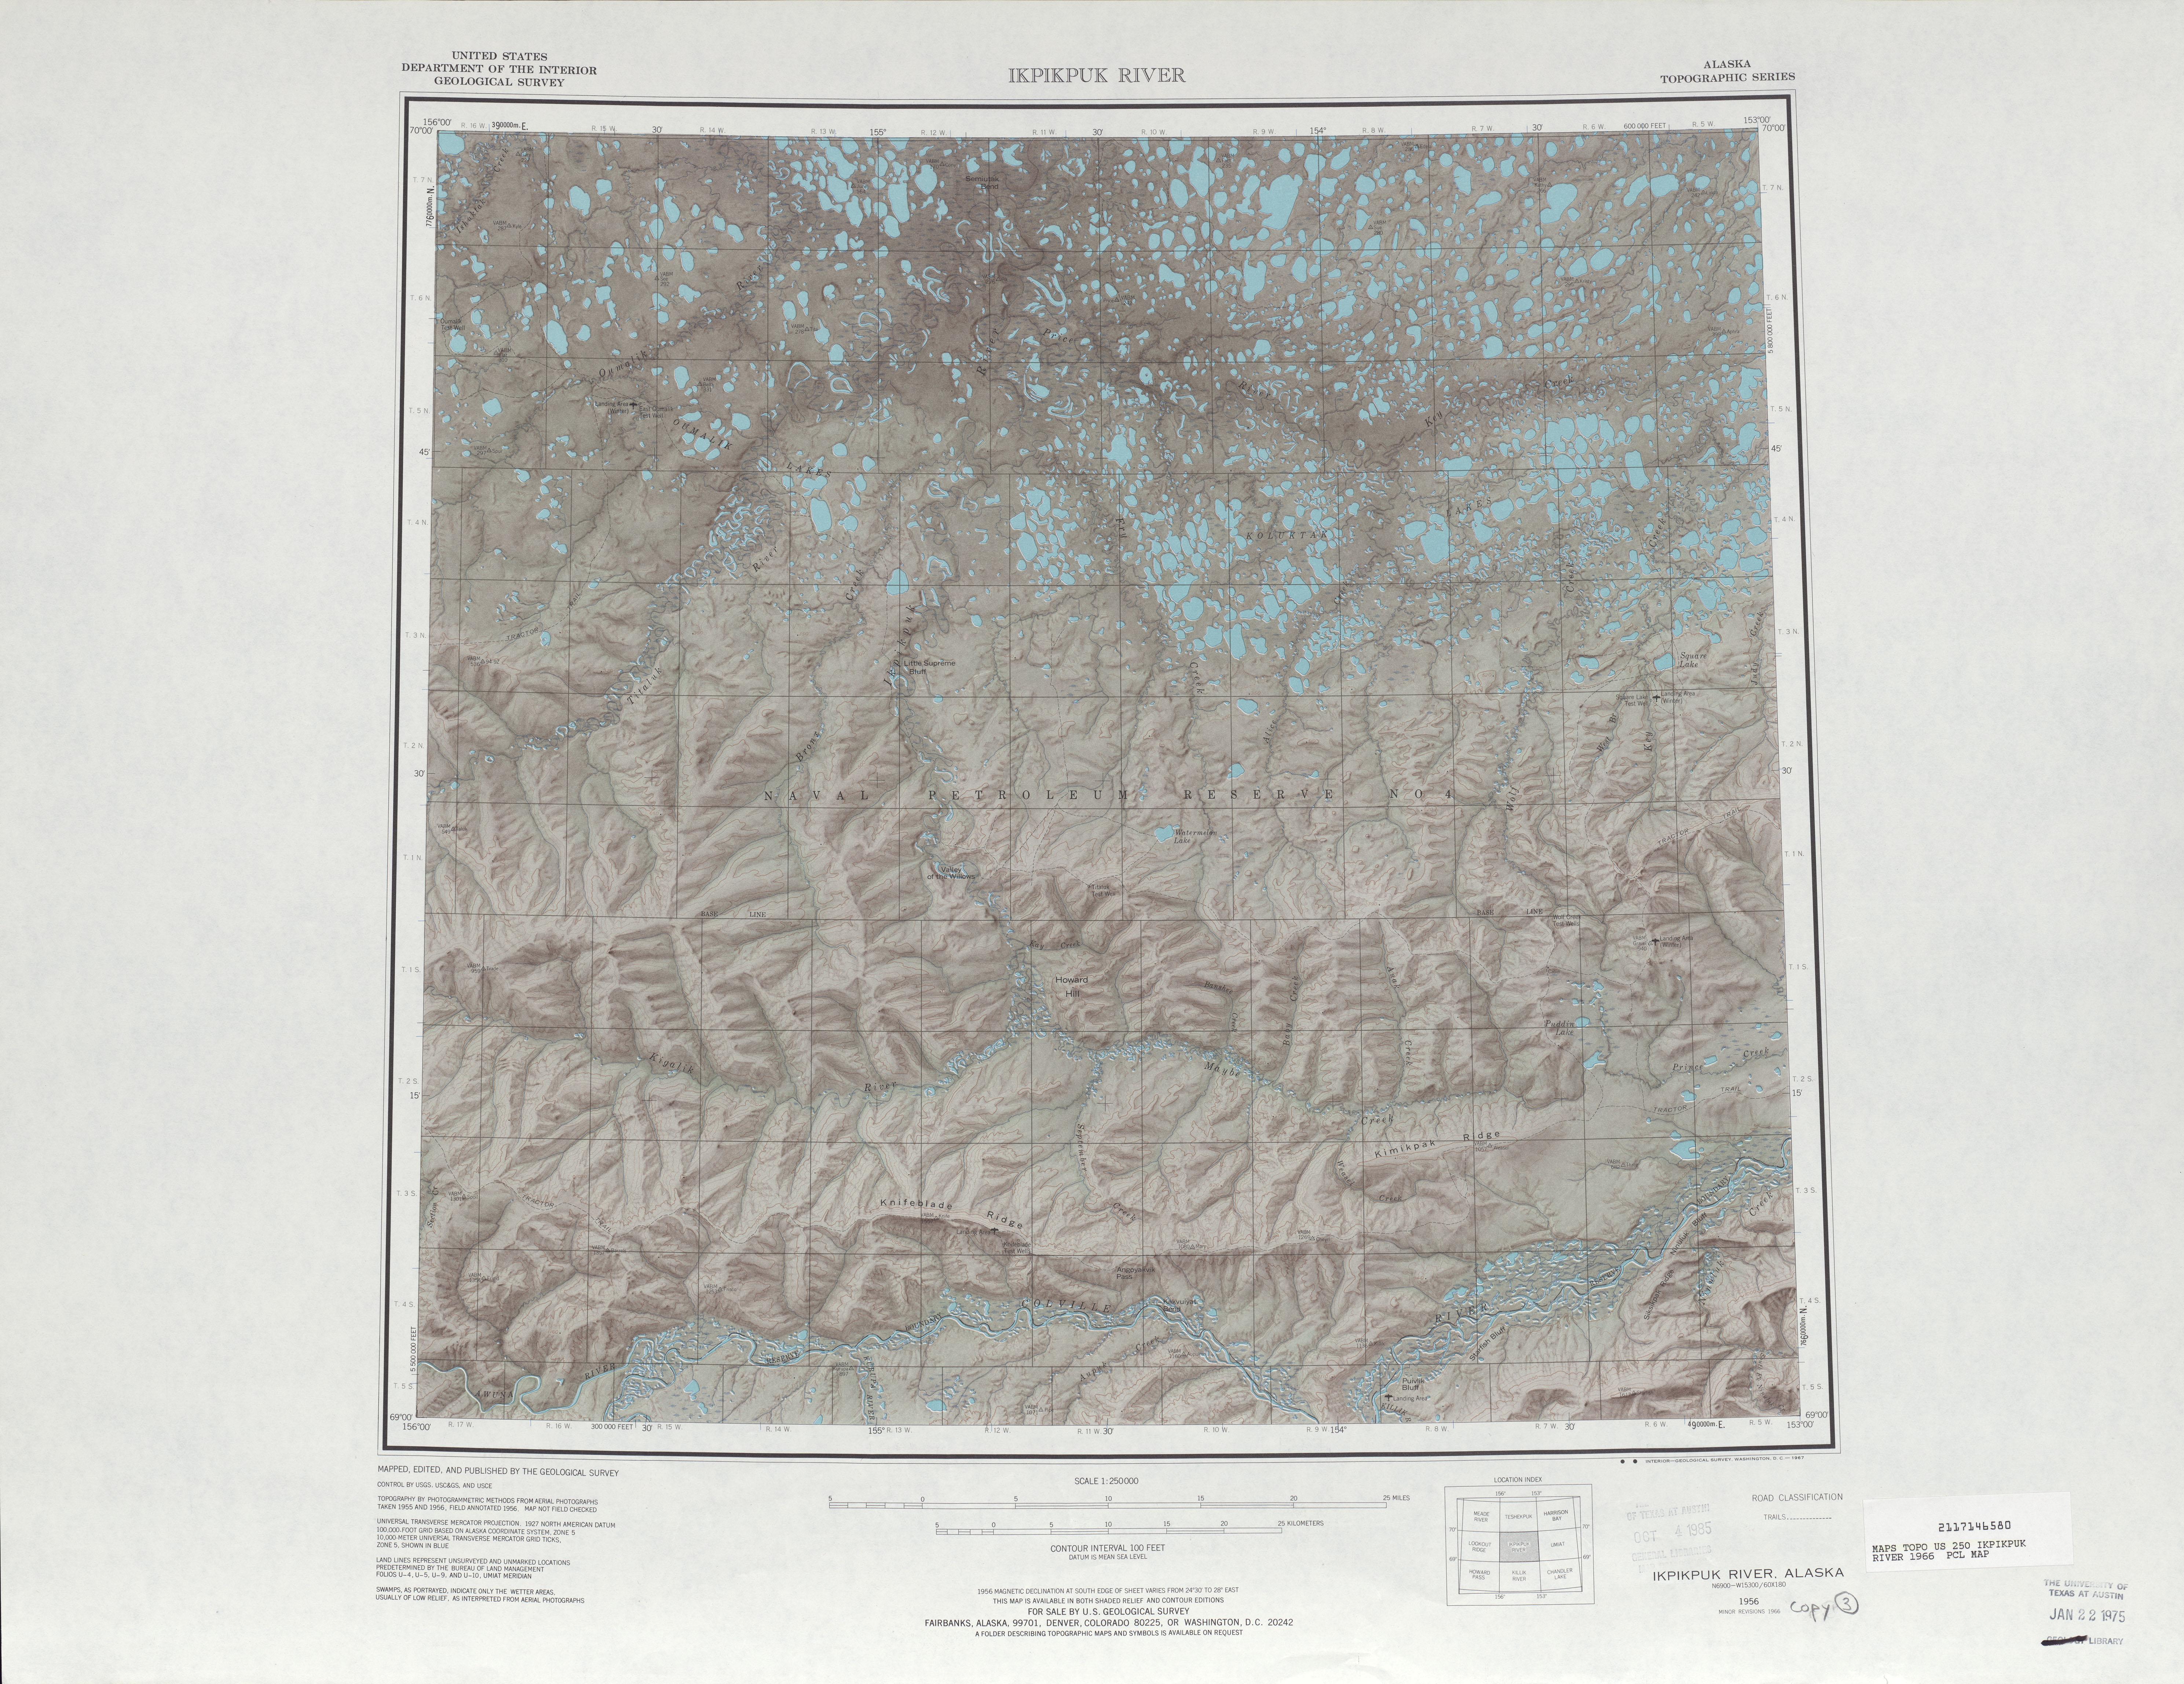 Ikpikpuk River Shaded Relief Map Sheet, United States 1966